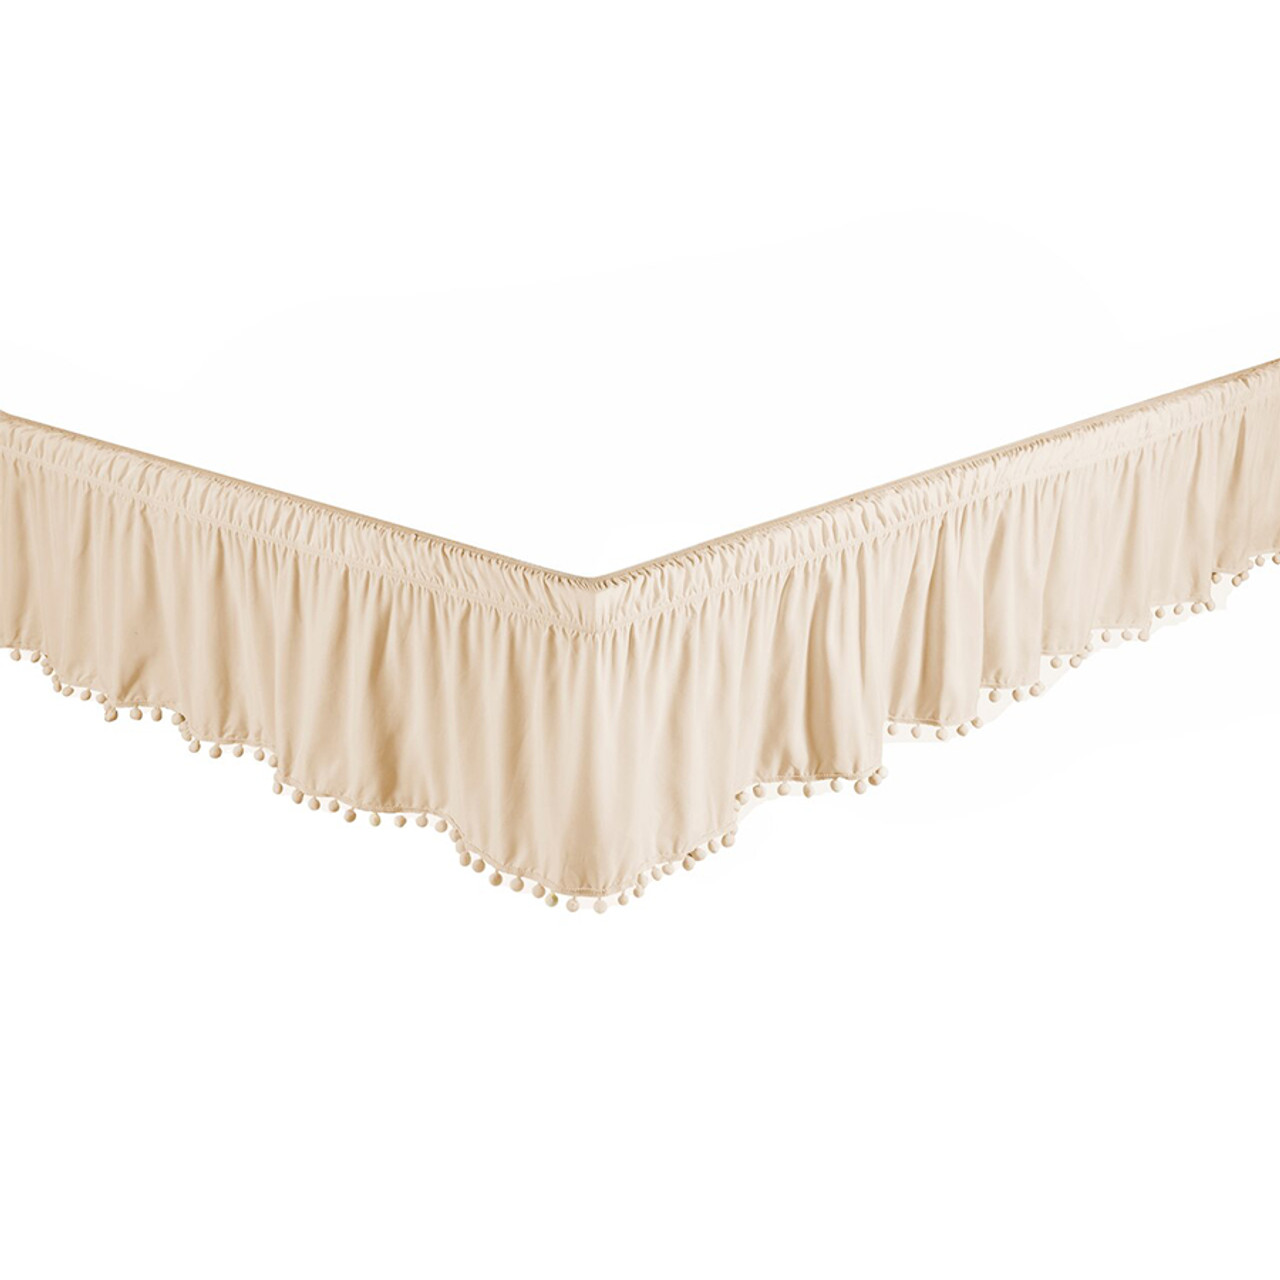 "Beige Bed Skirt Dust Ruffle with Pom-Pom Fringe 100% Brushed Microfiber with 14"" Drop in USA, California, New York, New York City, Los Angeles, San Francisco, Pennsylvania, Washington DC, Virginia, Maryland"